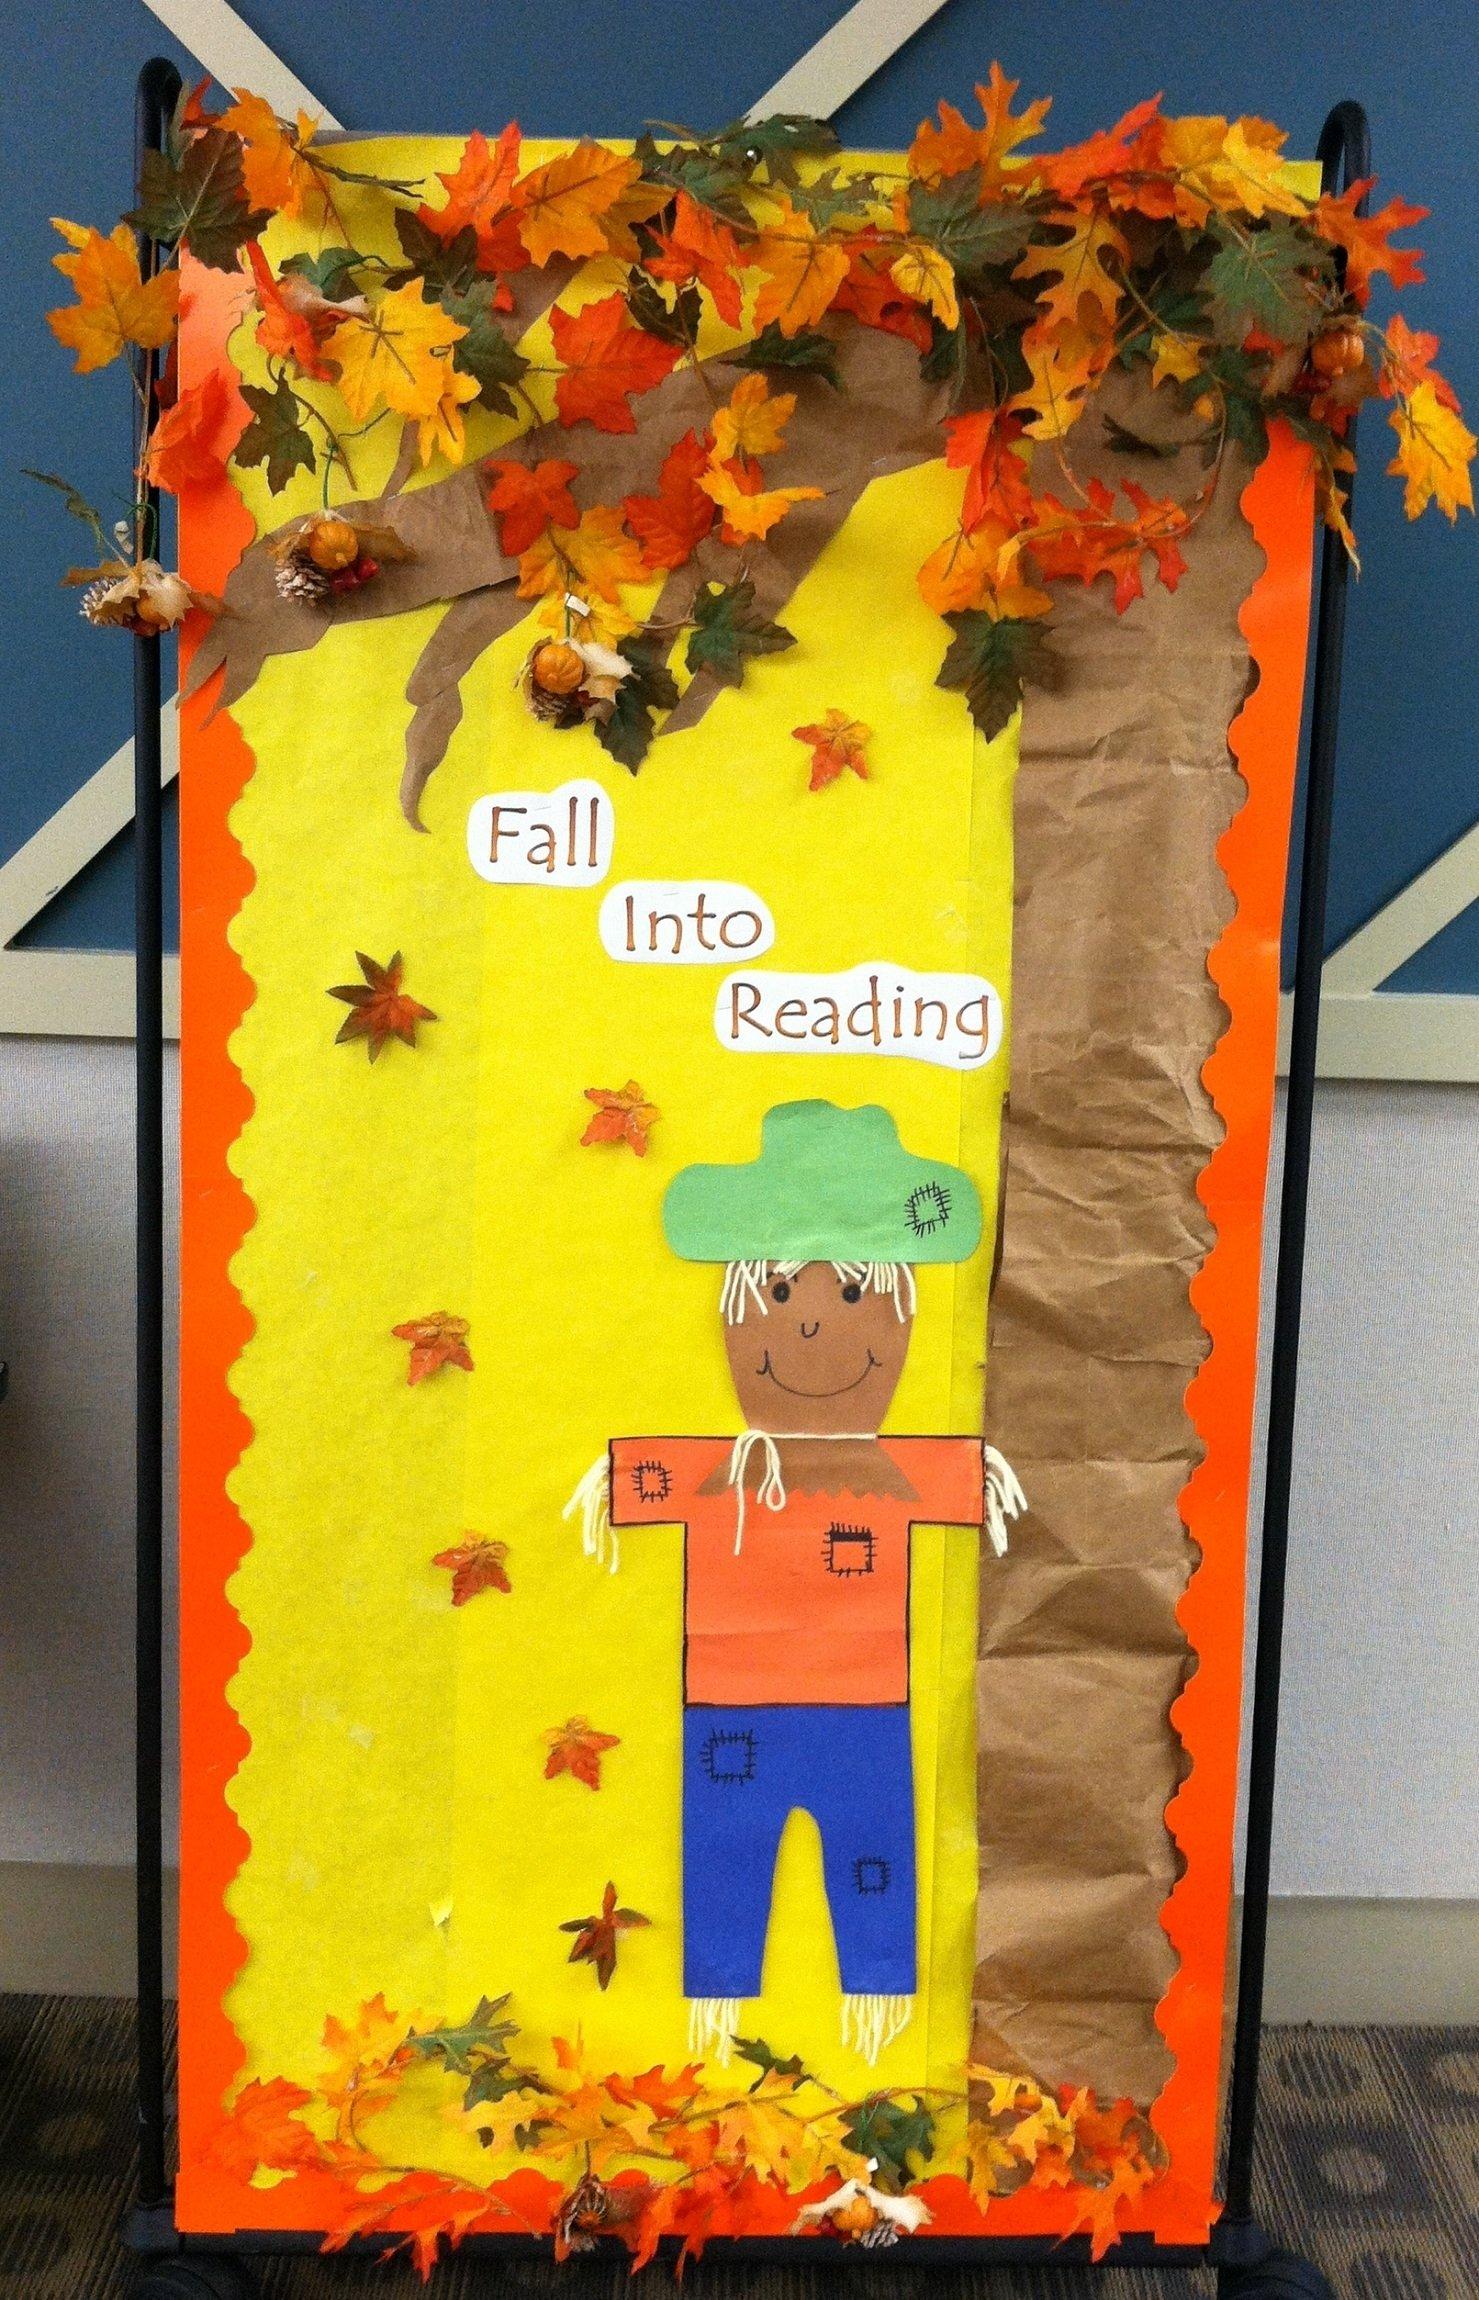 10 Elegant Fall Reading Bulletin Board Ideas fall into reading back to school bulletin board supplyme 2021